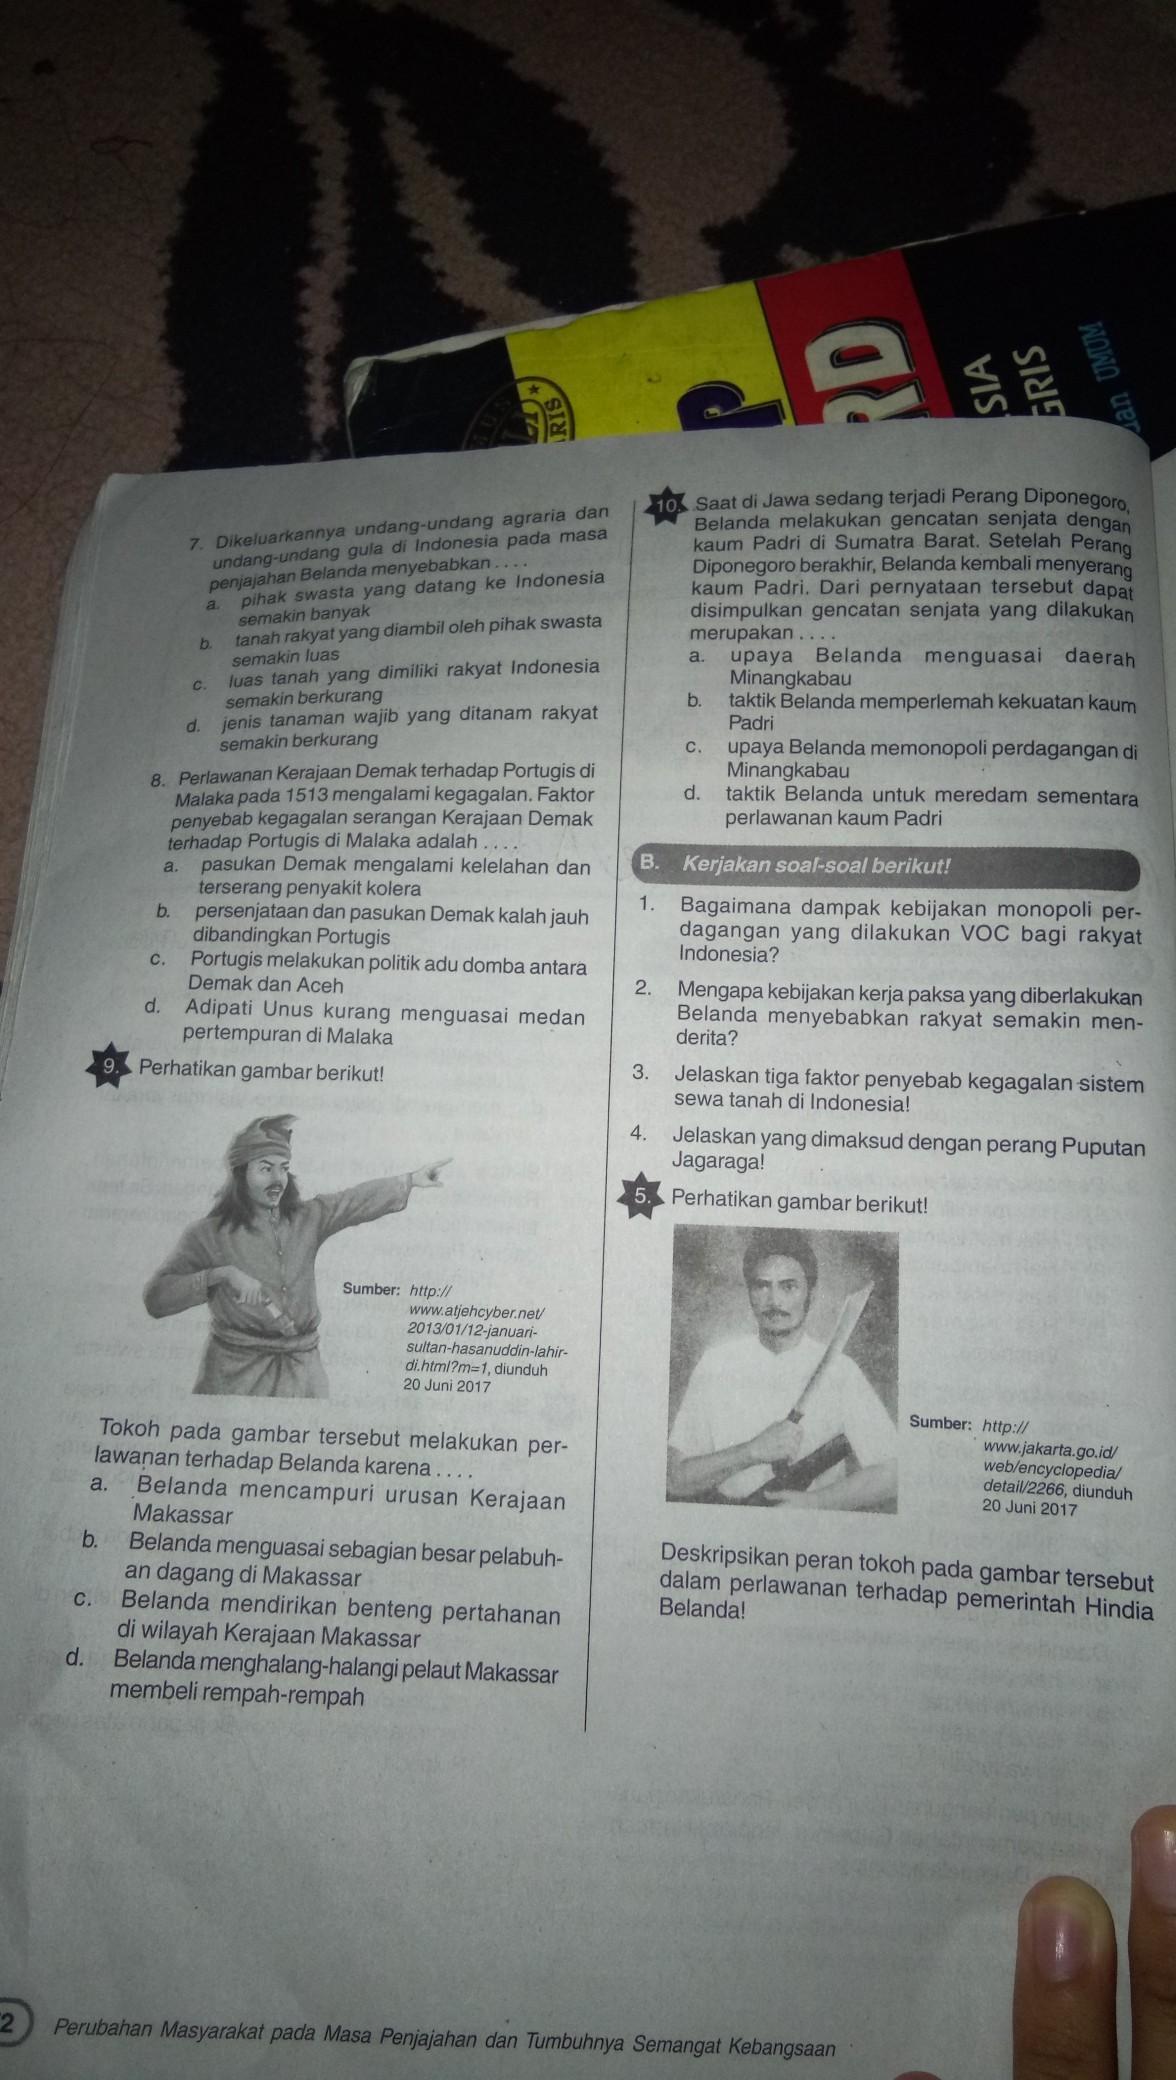 Jawaban Buku Lks Ips Kelas 8 Semester 2 Halaman 72 Brainly Co Id